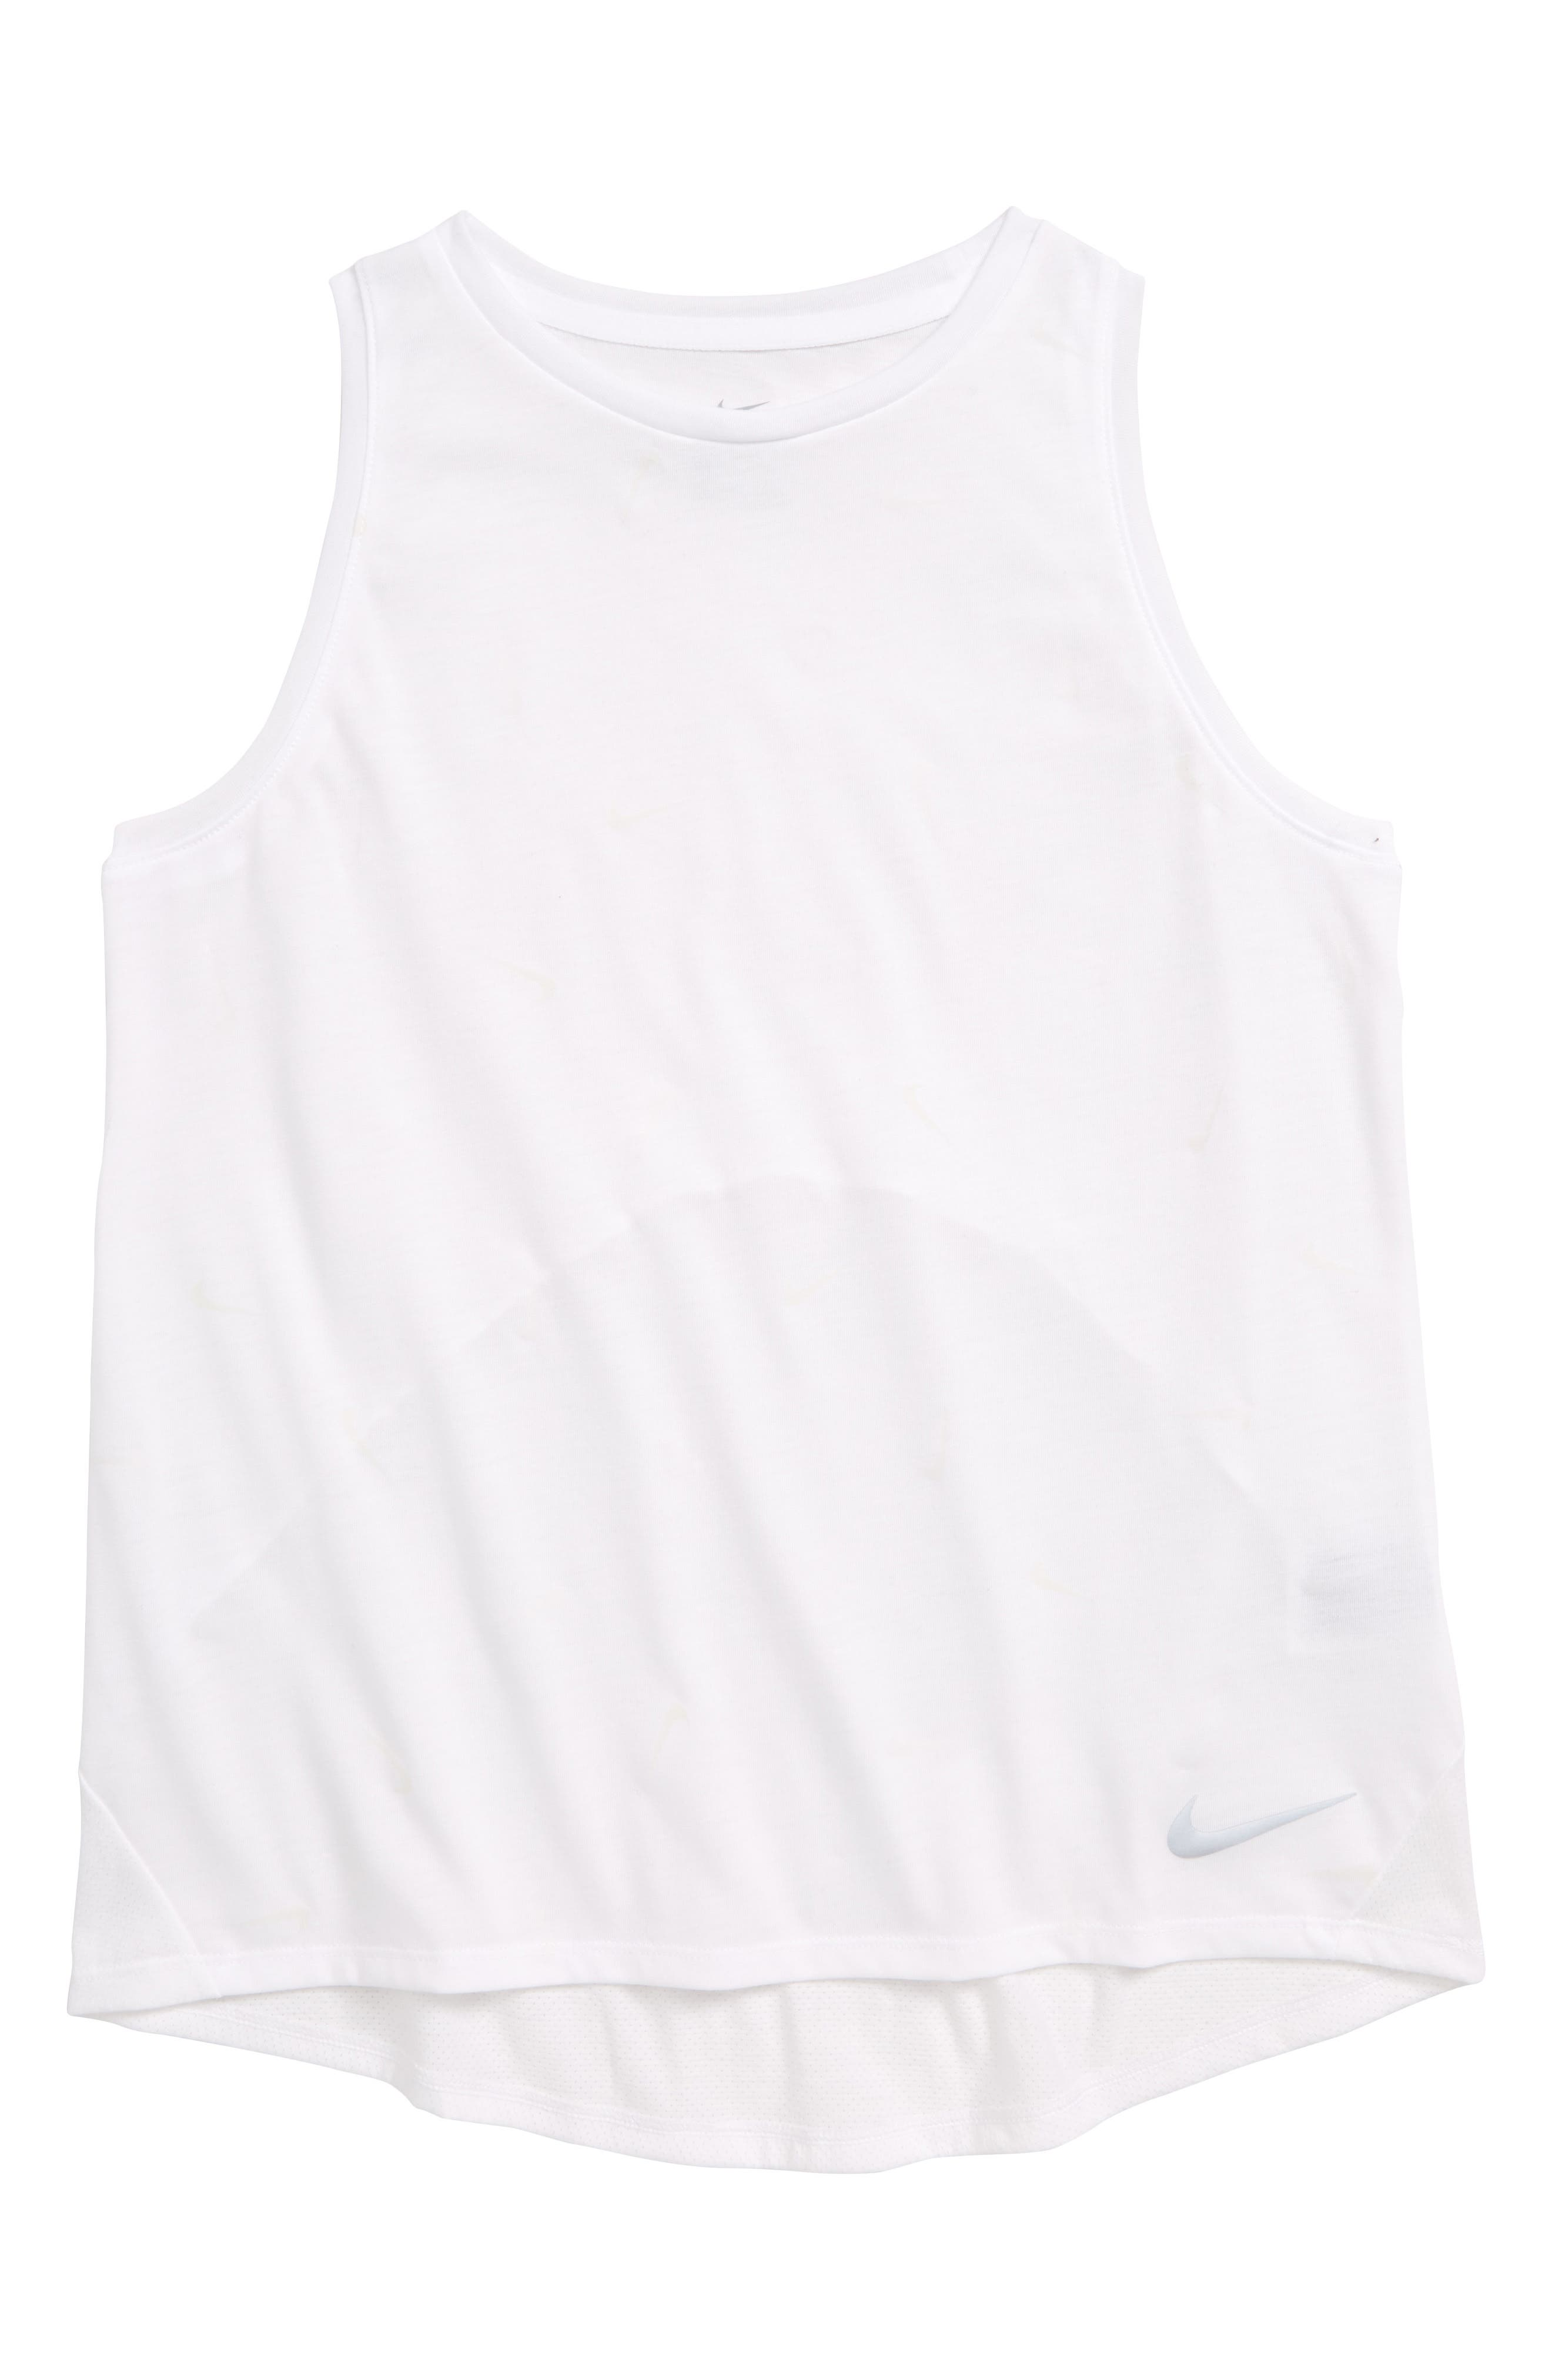 NIKE Dri-FIT Breathe UV-Activated Logo Print Running Tank, Main, color, WHITE/ REFLECTIVE SILV